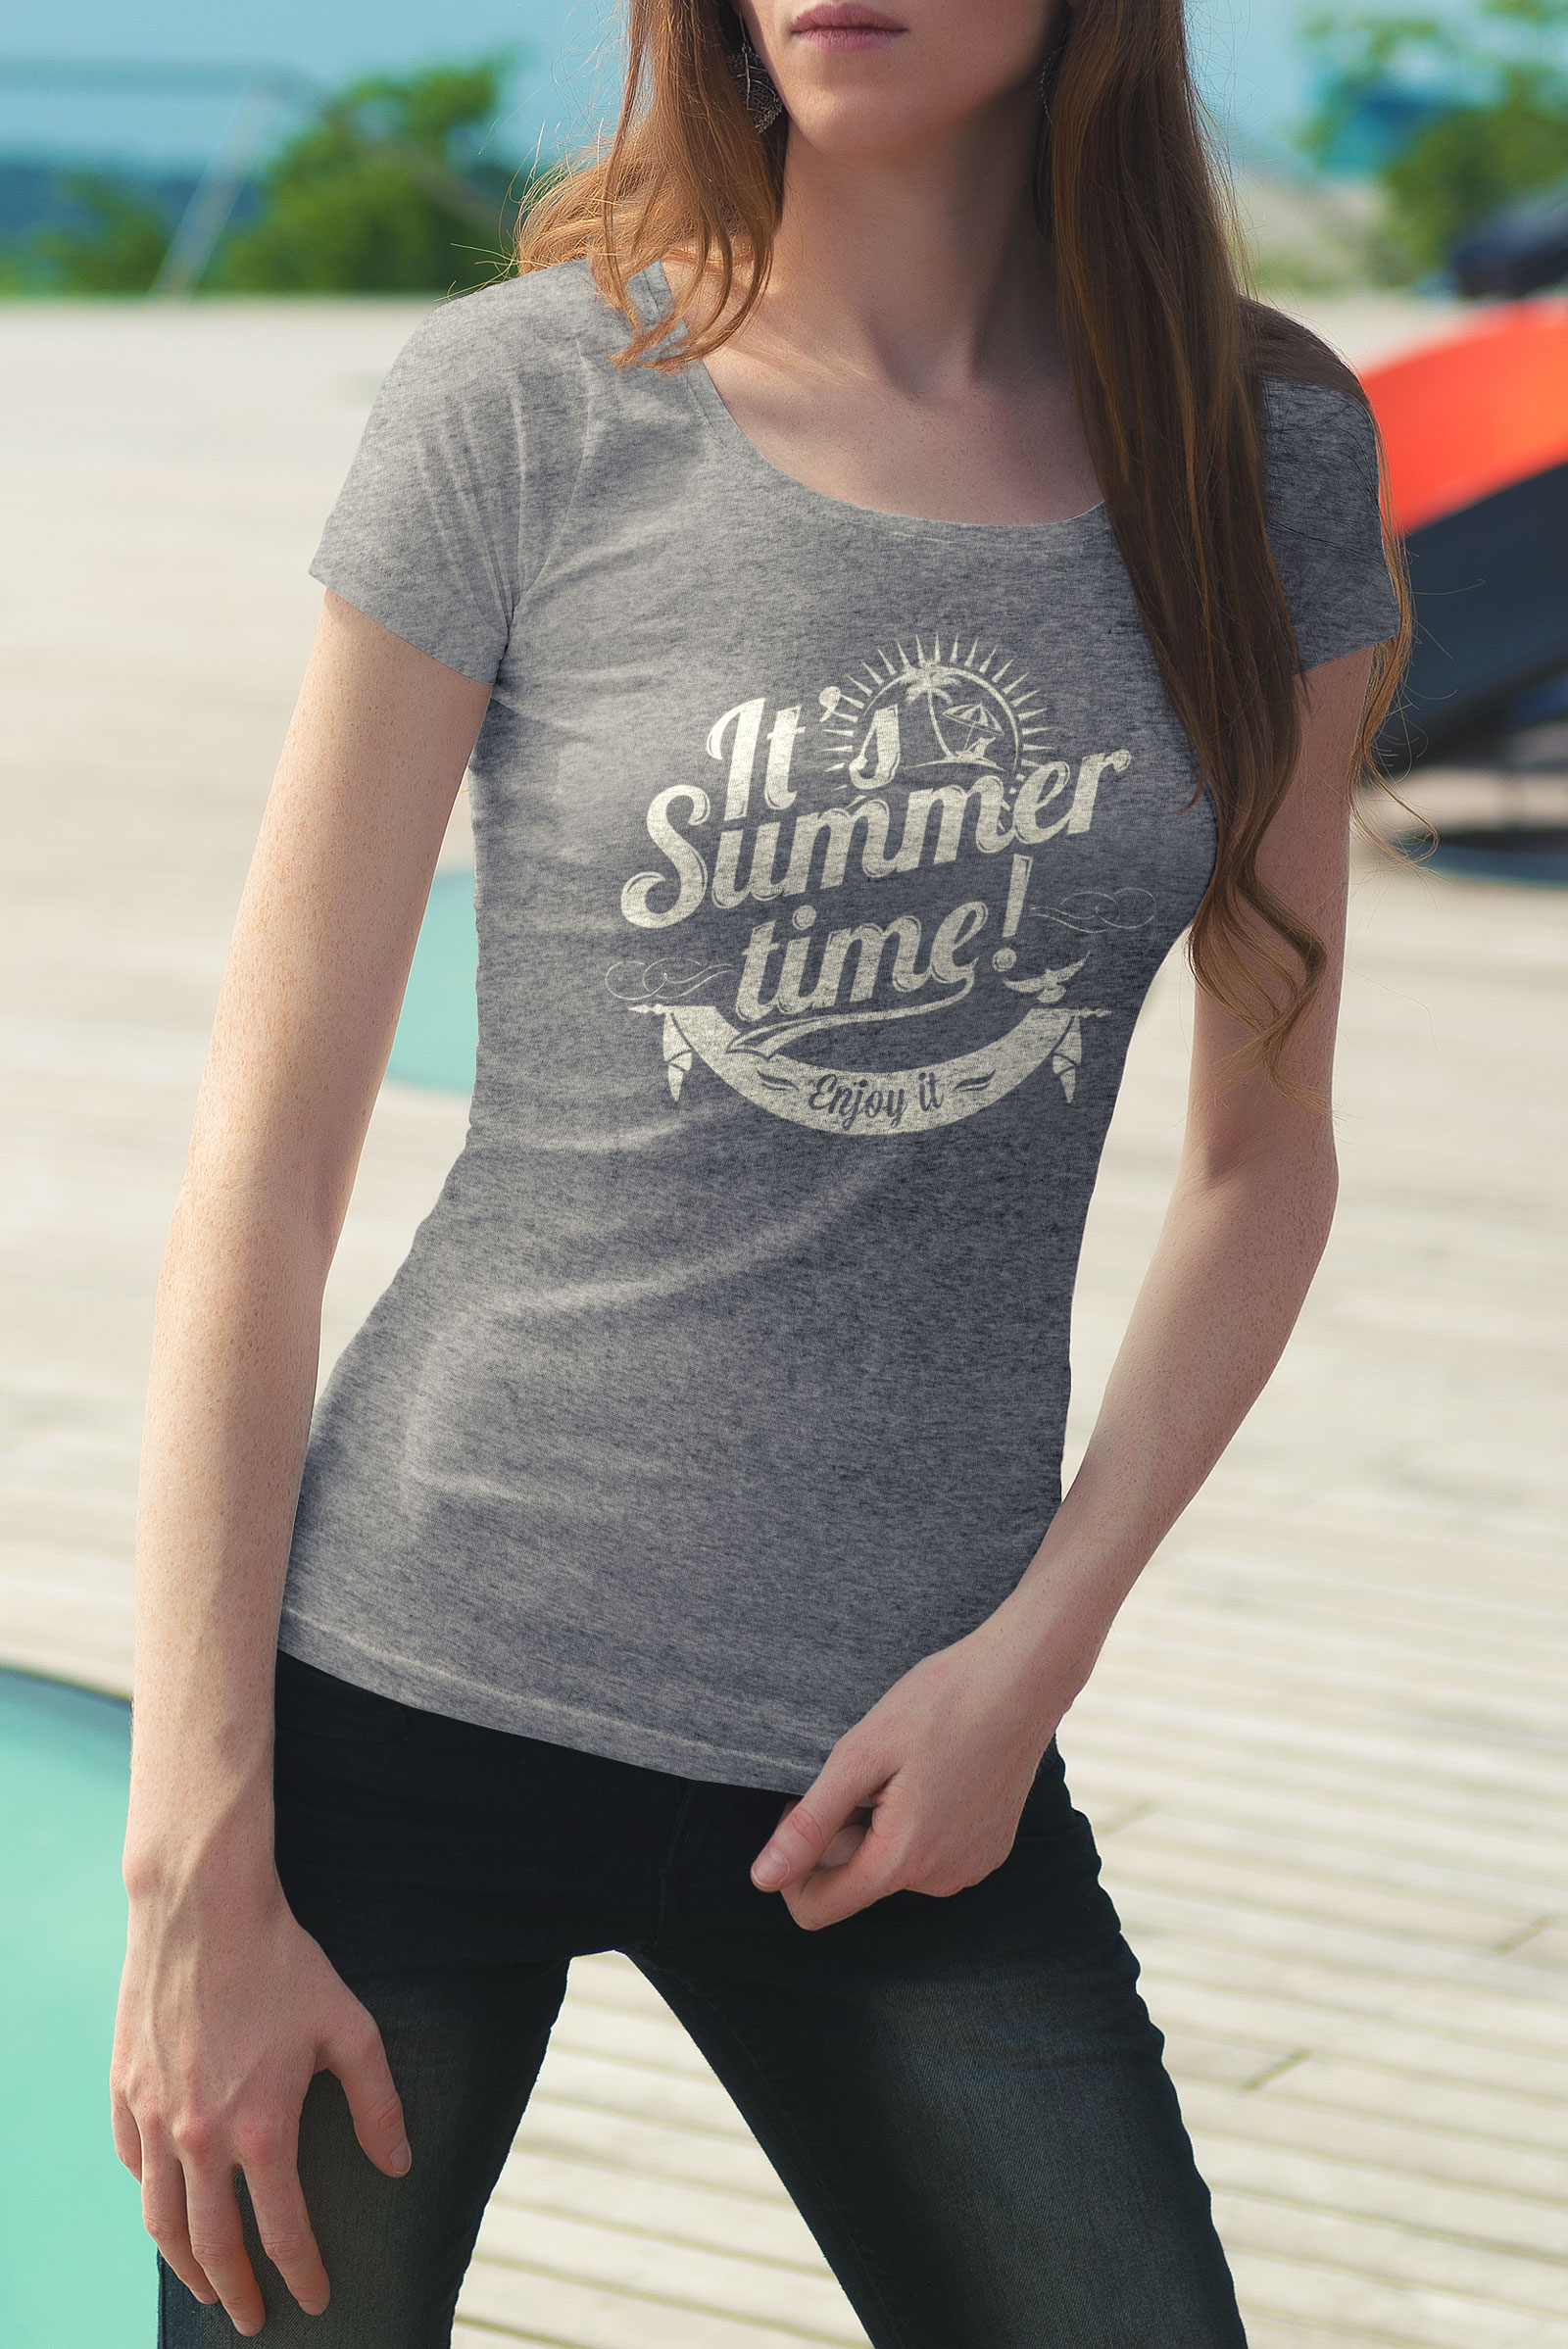 Free-Female-T-Shirt-Mockup-PSD